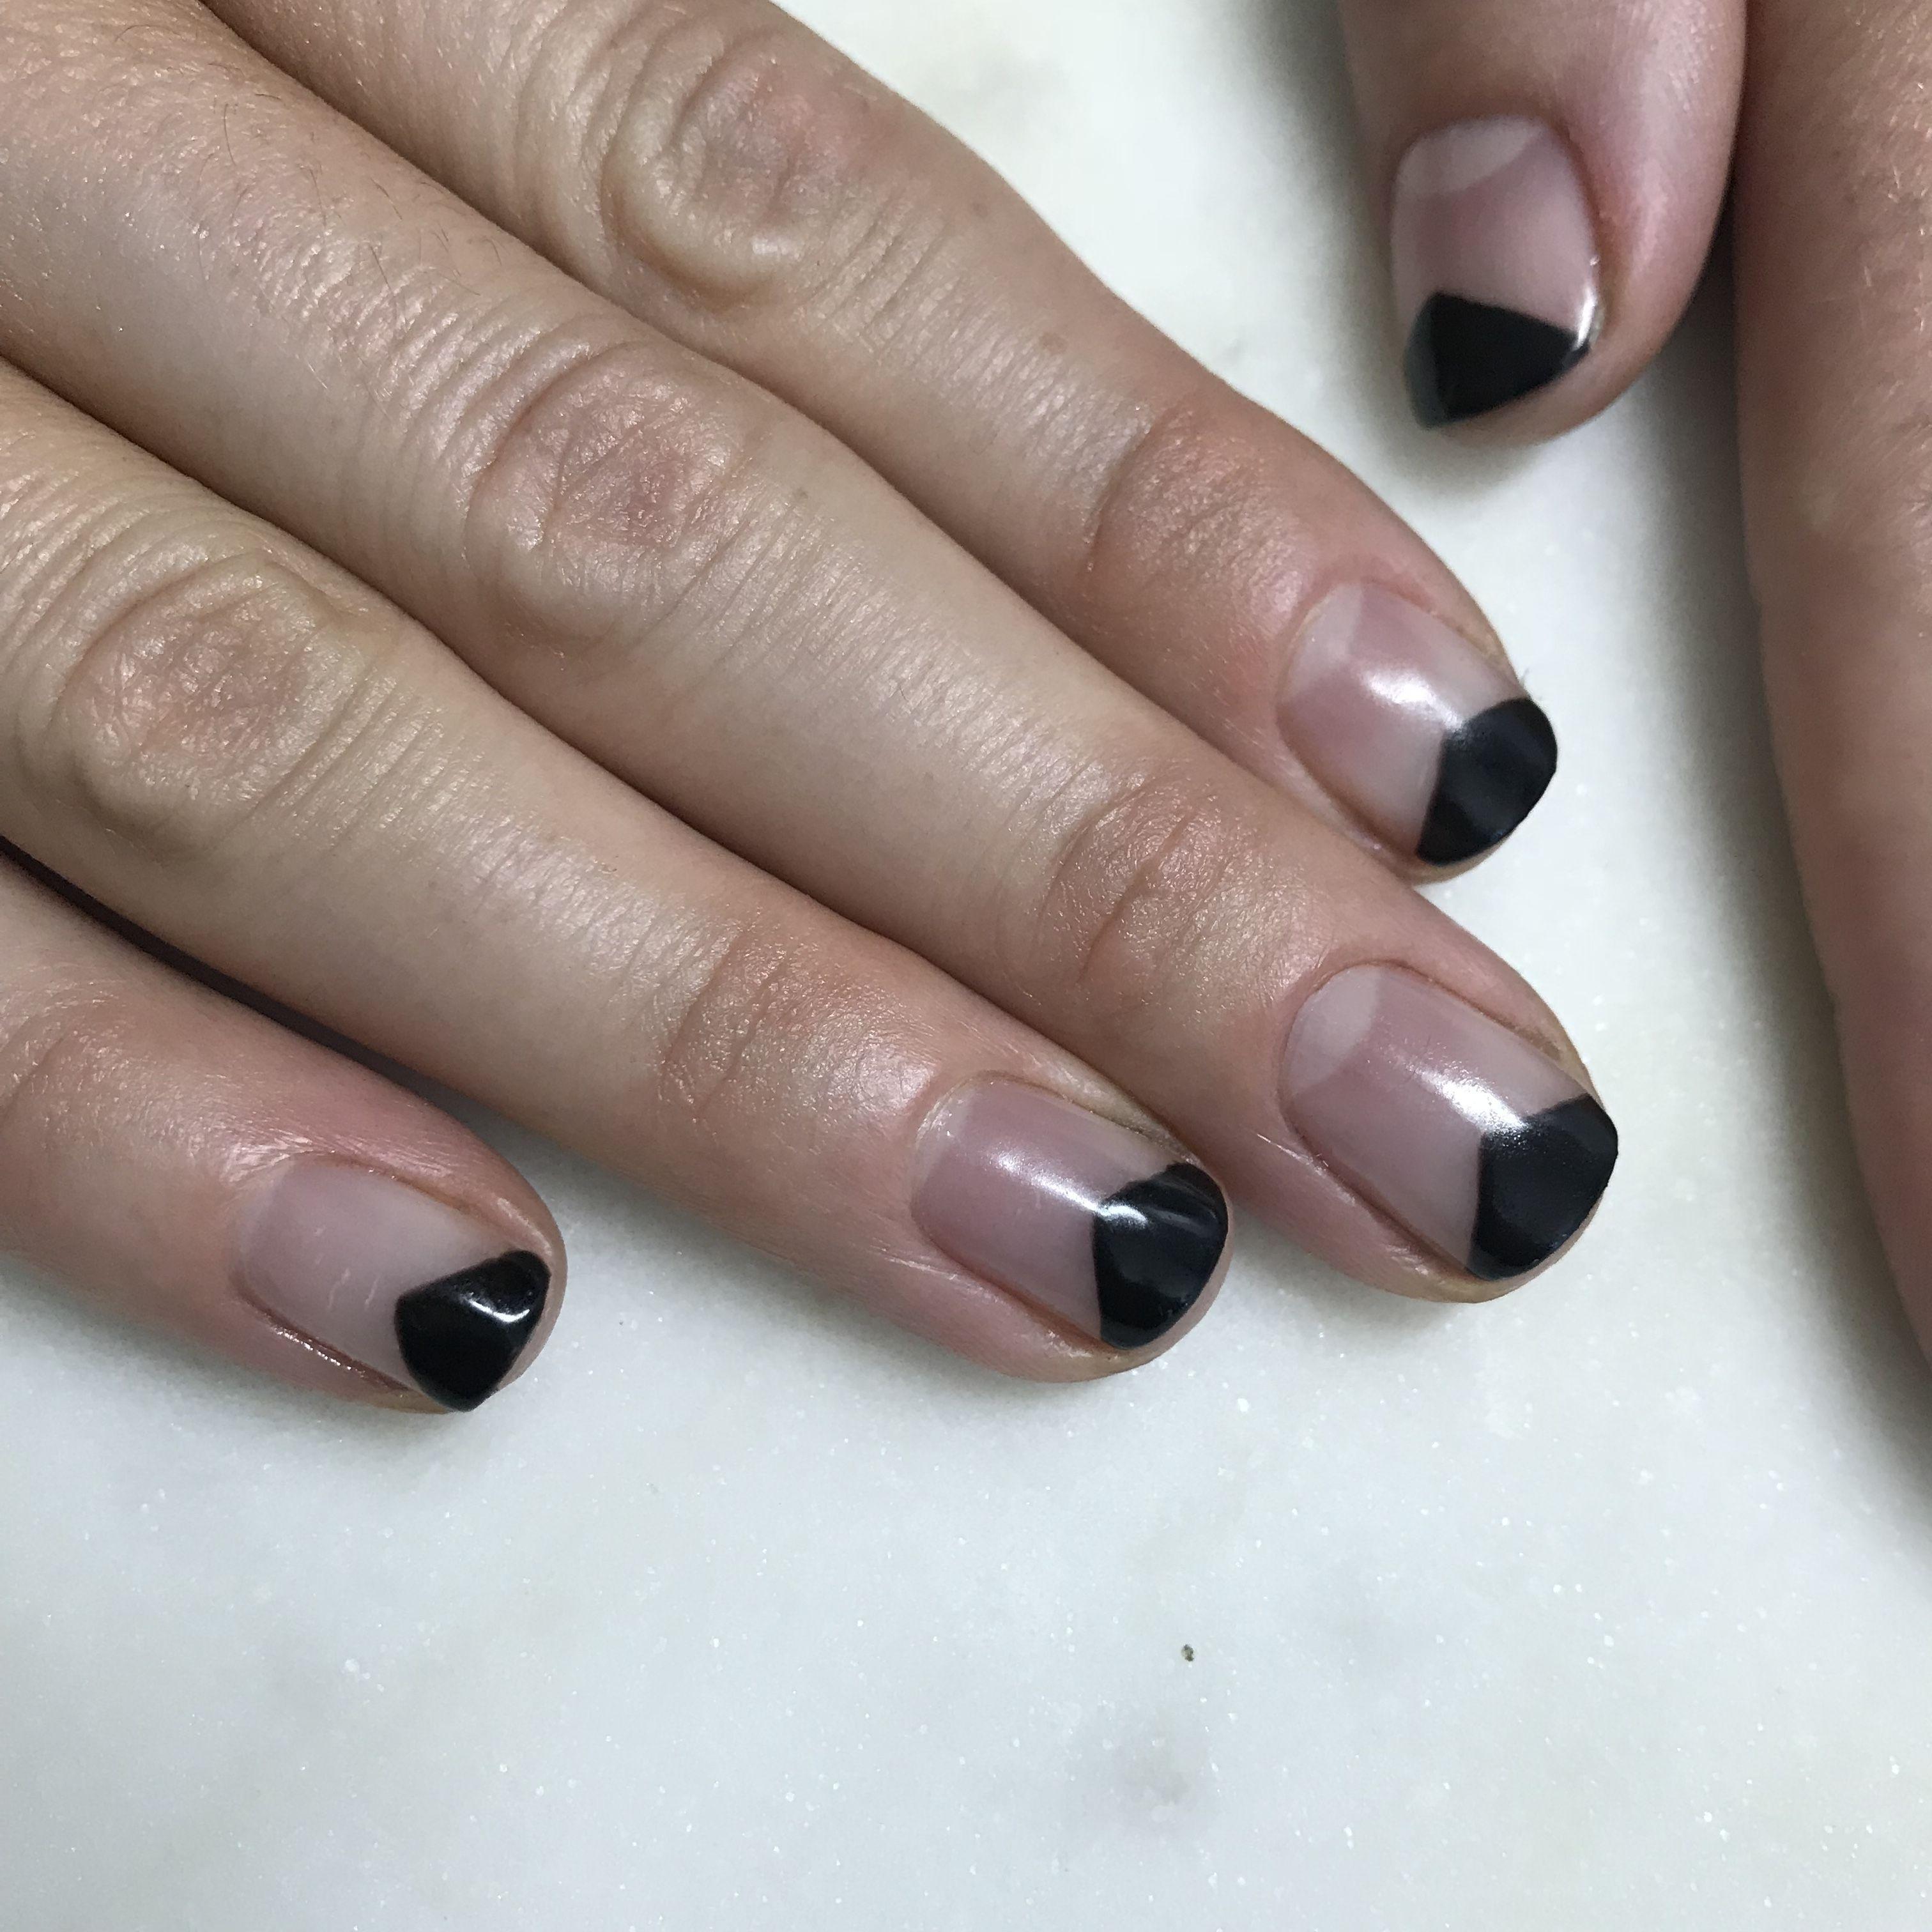 By Diane Diaz Cnd Shellac Manicure Nail Art Cnd Education